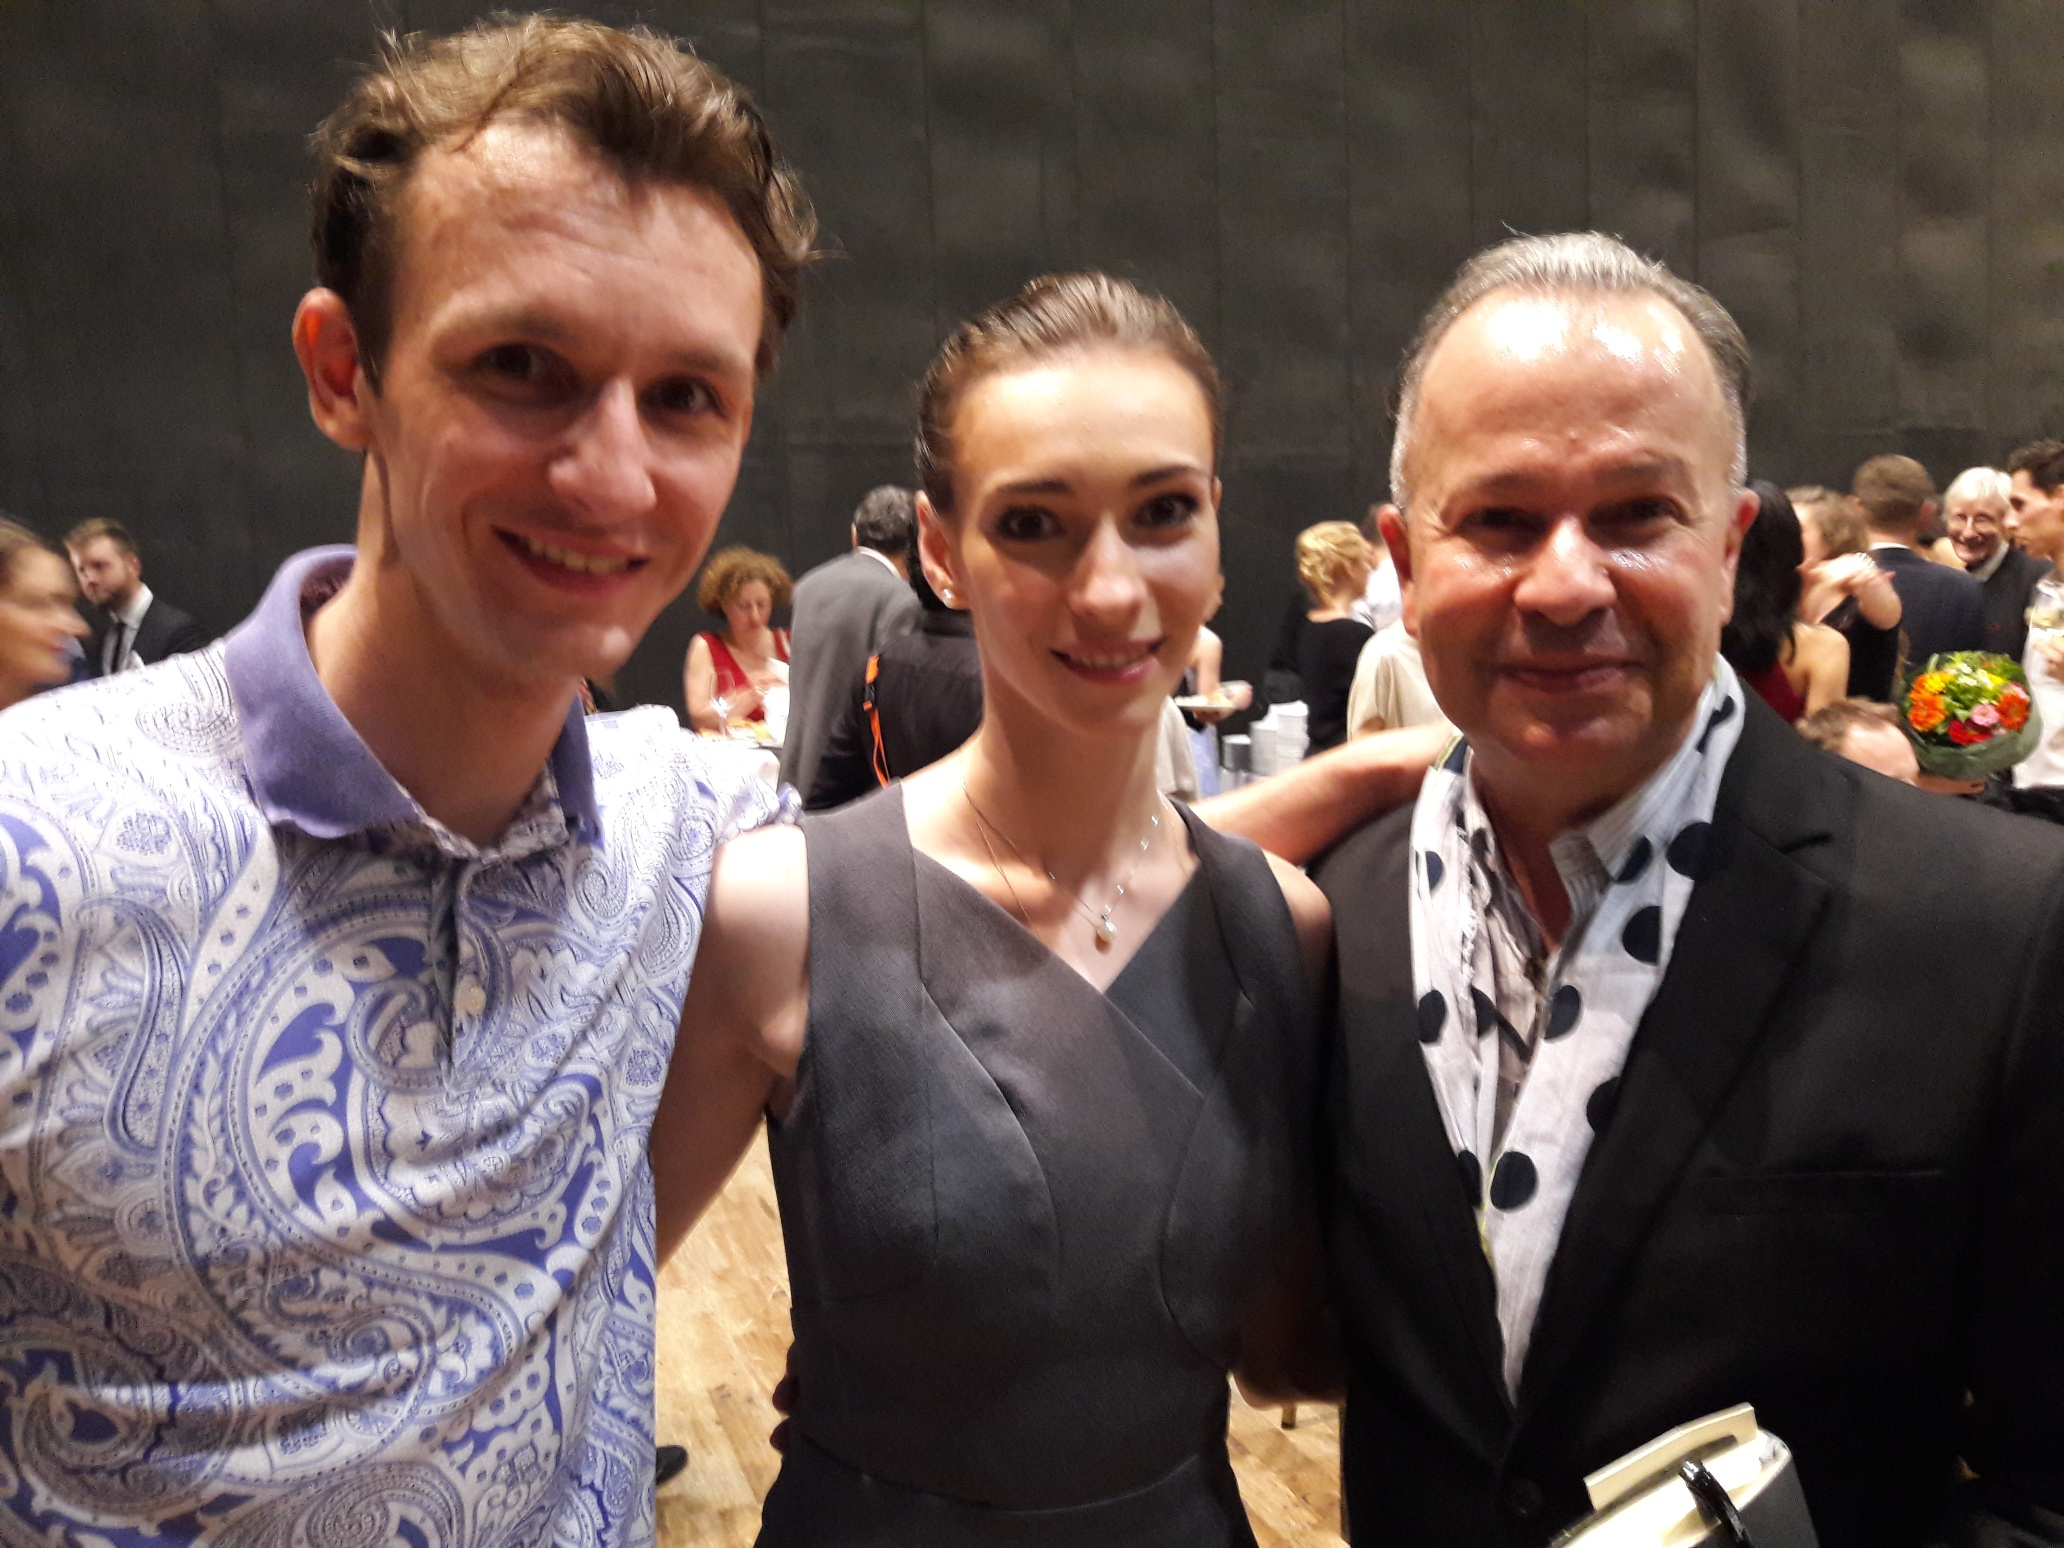 with Olga Smirnova and Semyon Chudin.